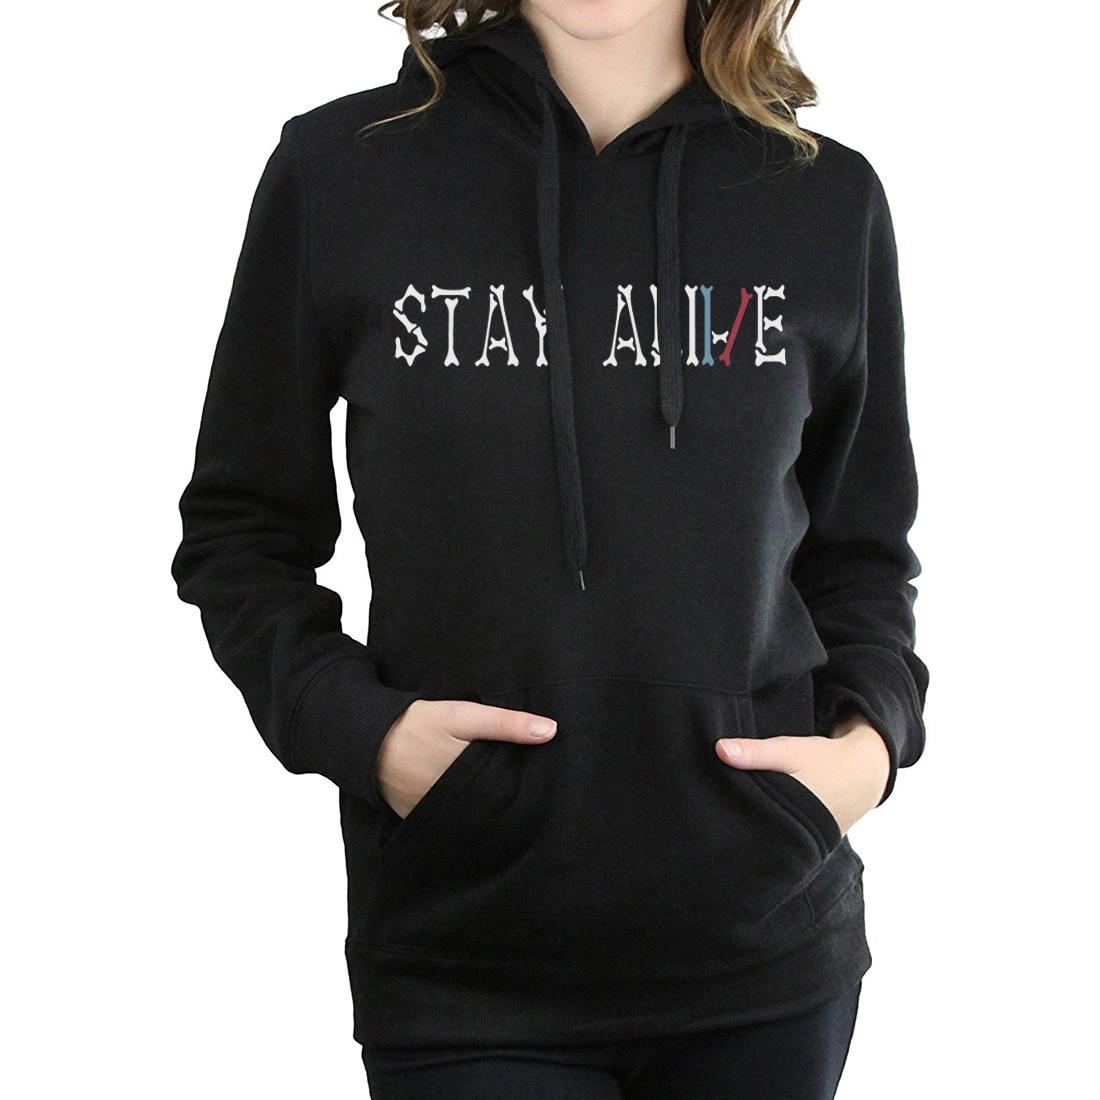 2019 women fleece hip-hop hoodies harajuku new top fashion sweatshirt stay alive letter print tracksuit femme fitness pullovers